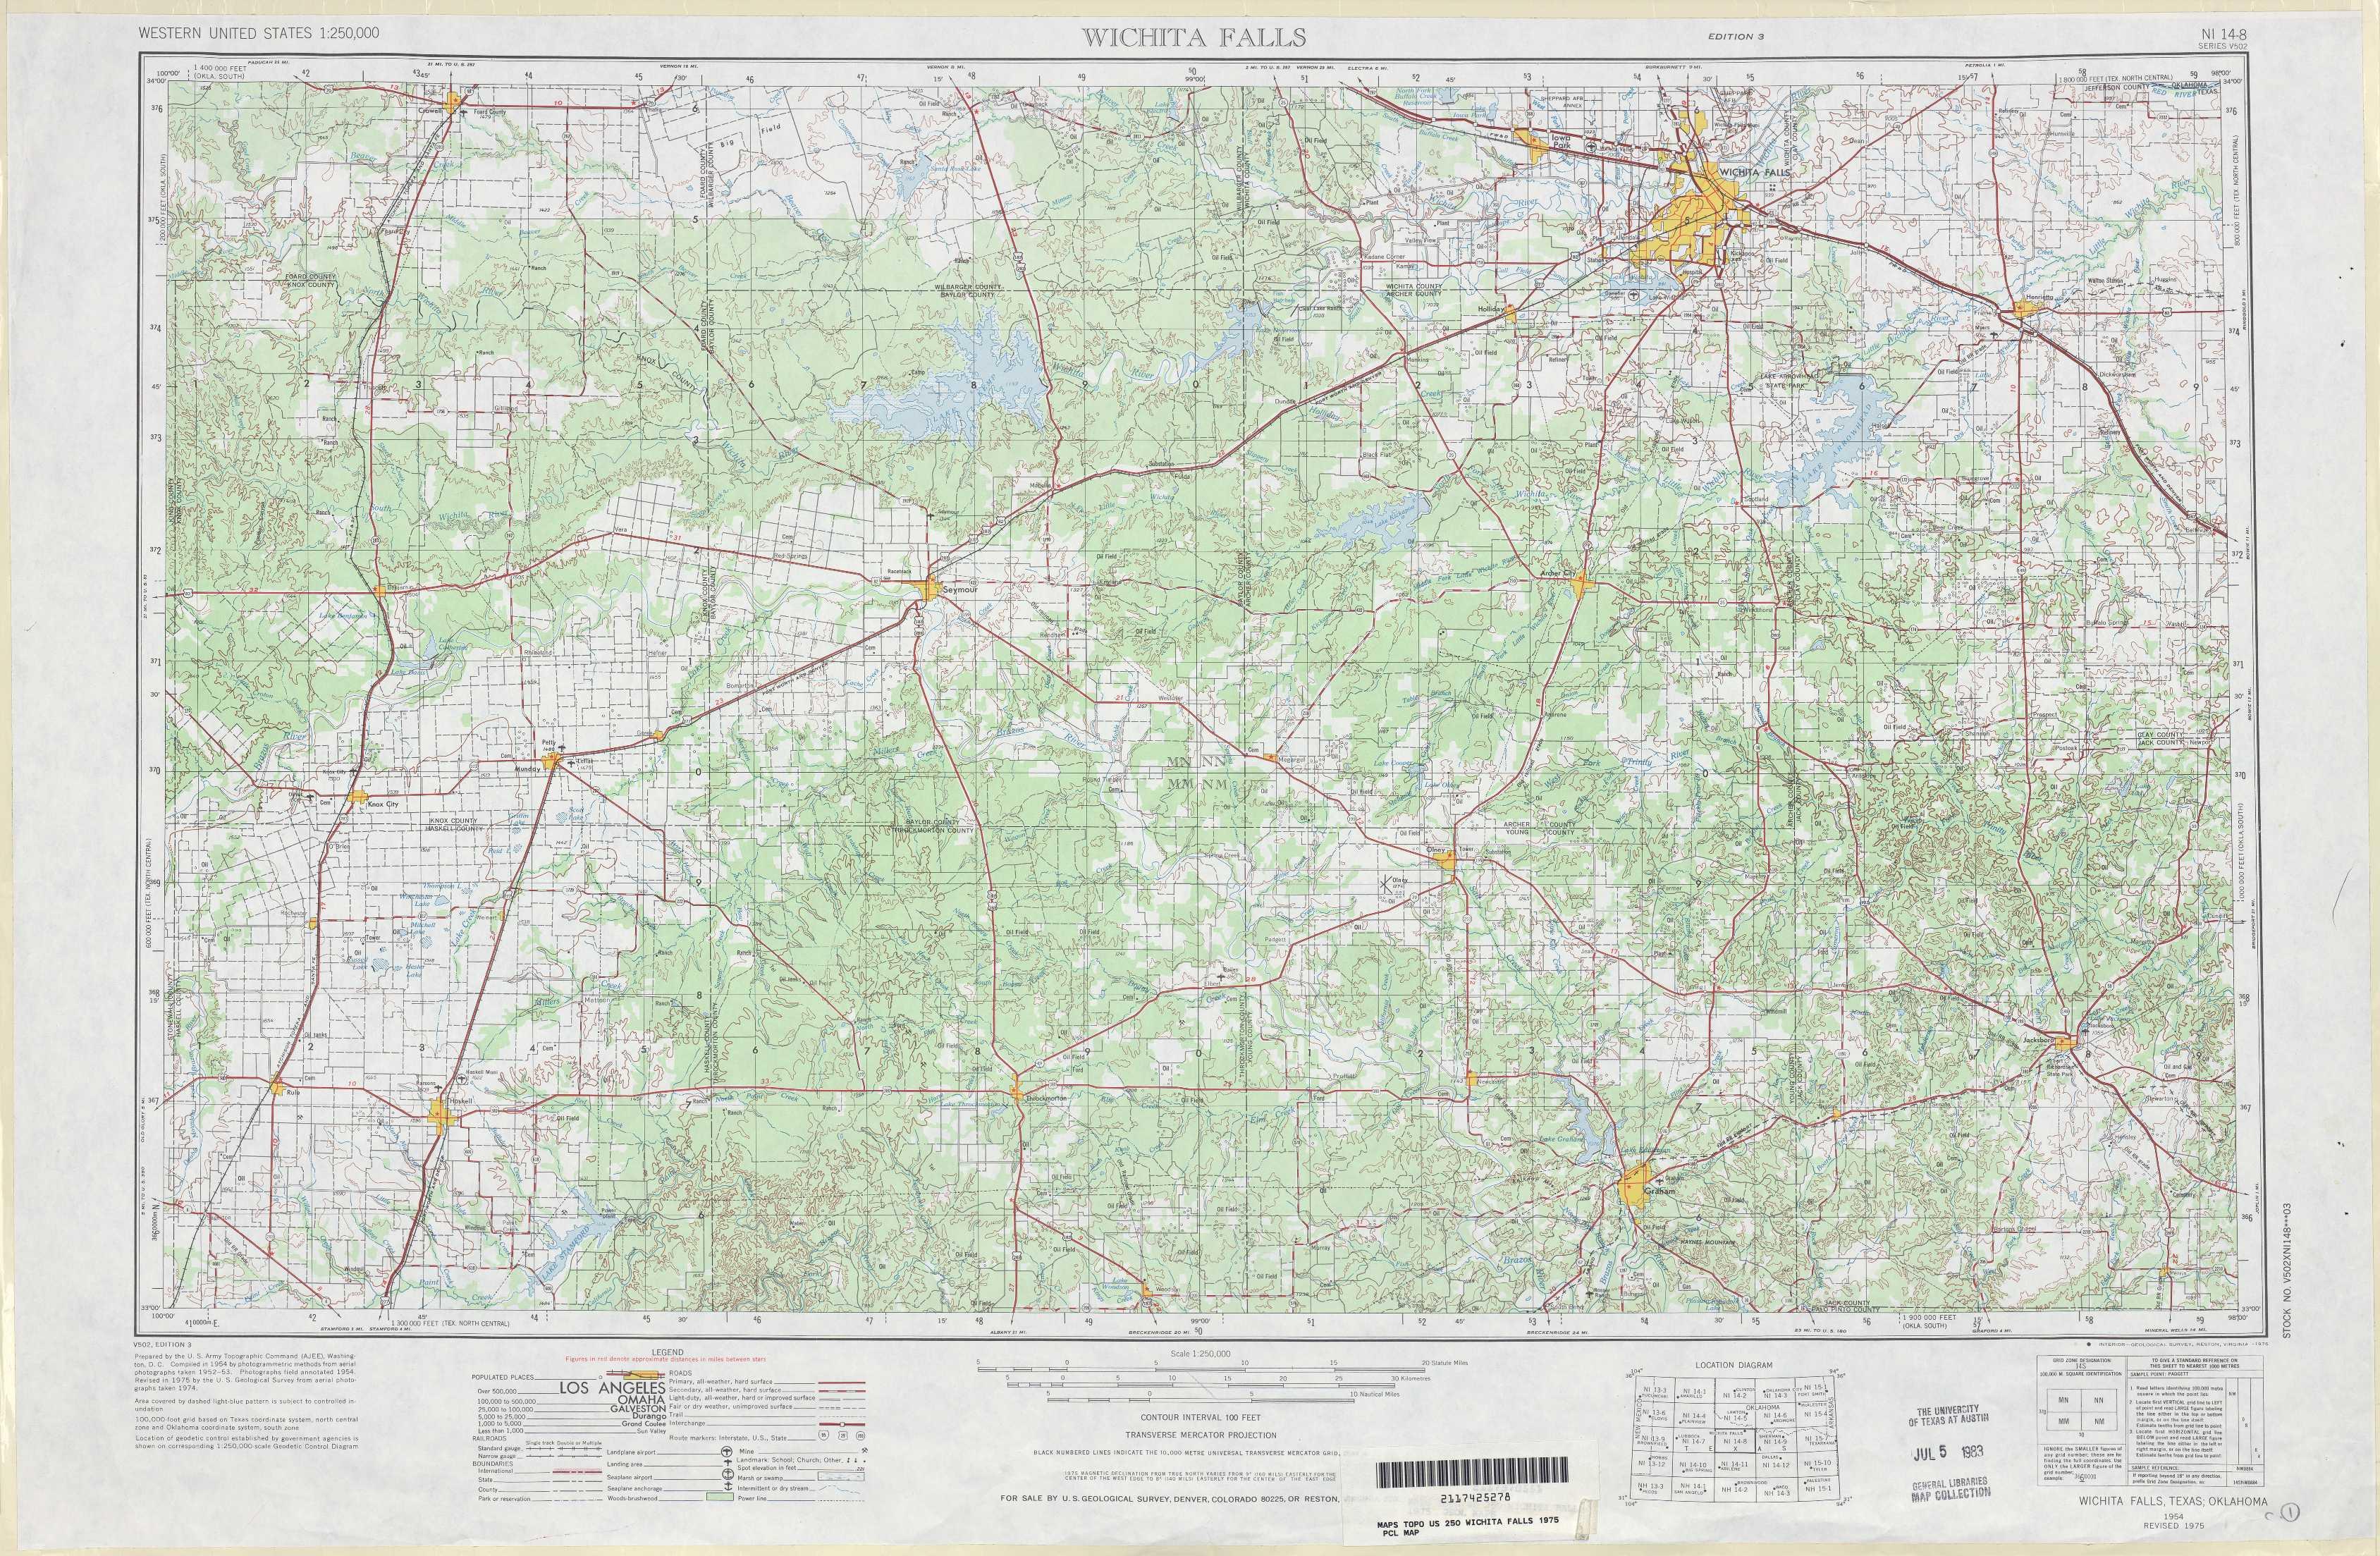 Wichita Falls topographic maps TX OK USGS Topo Quad 33098a1 at 1